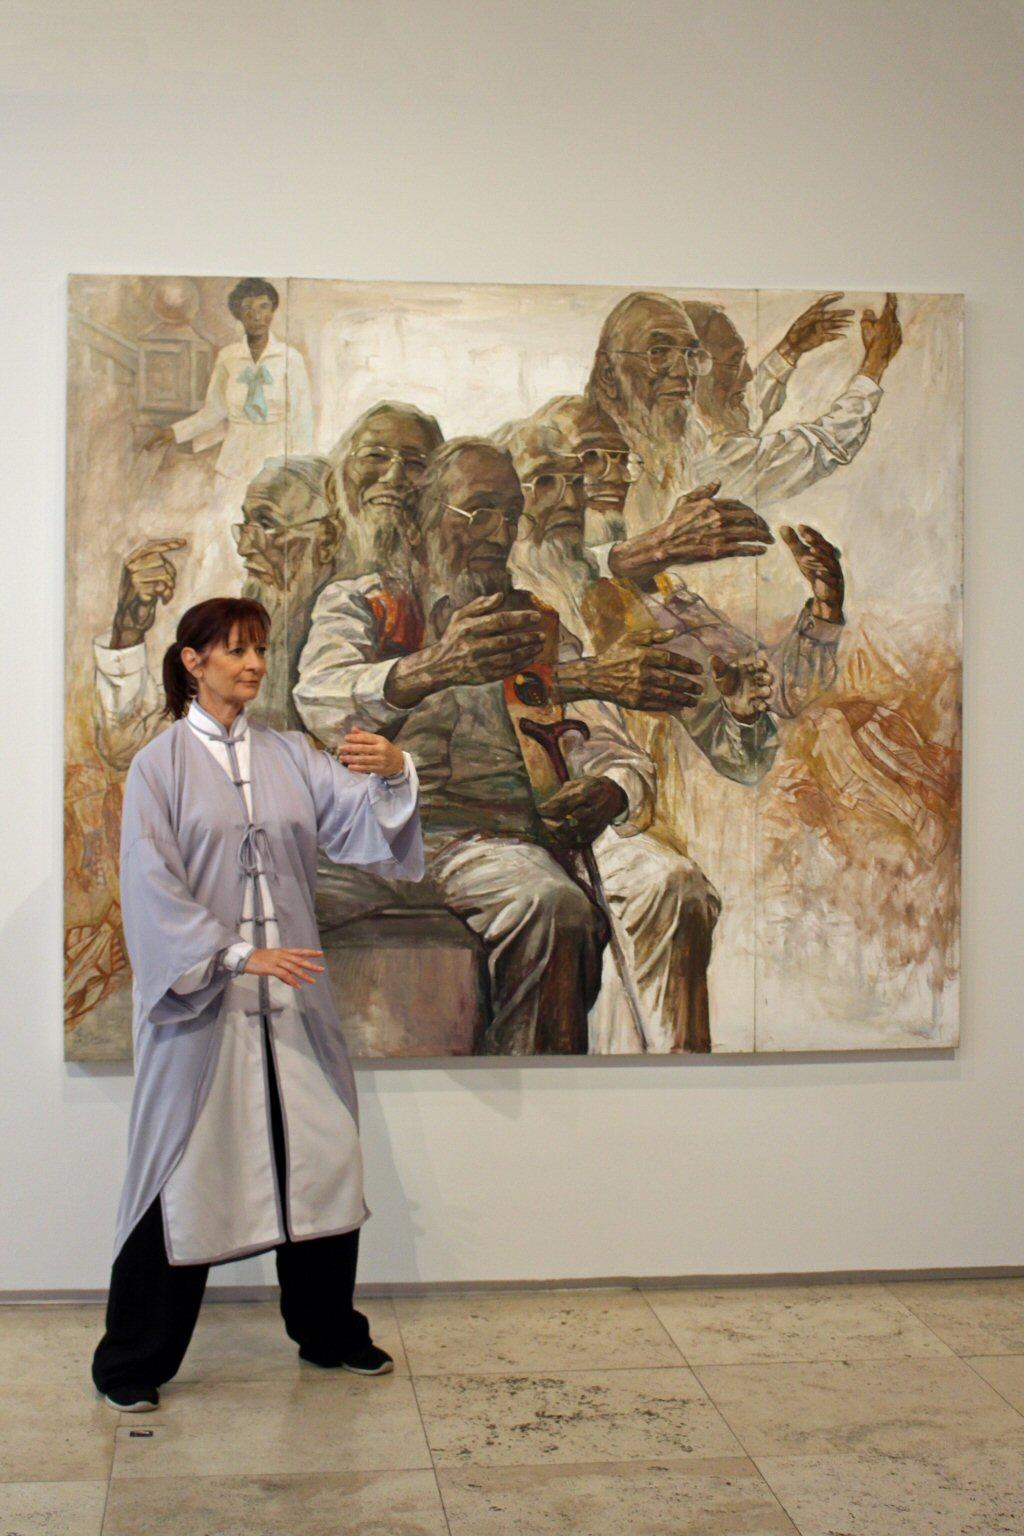 Amanda-Heidtke-Art-Gallery-Newcastle-February-2021-1024x1536